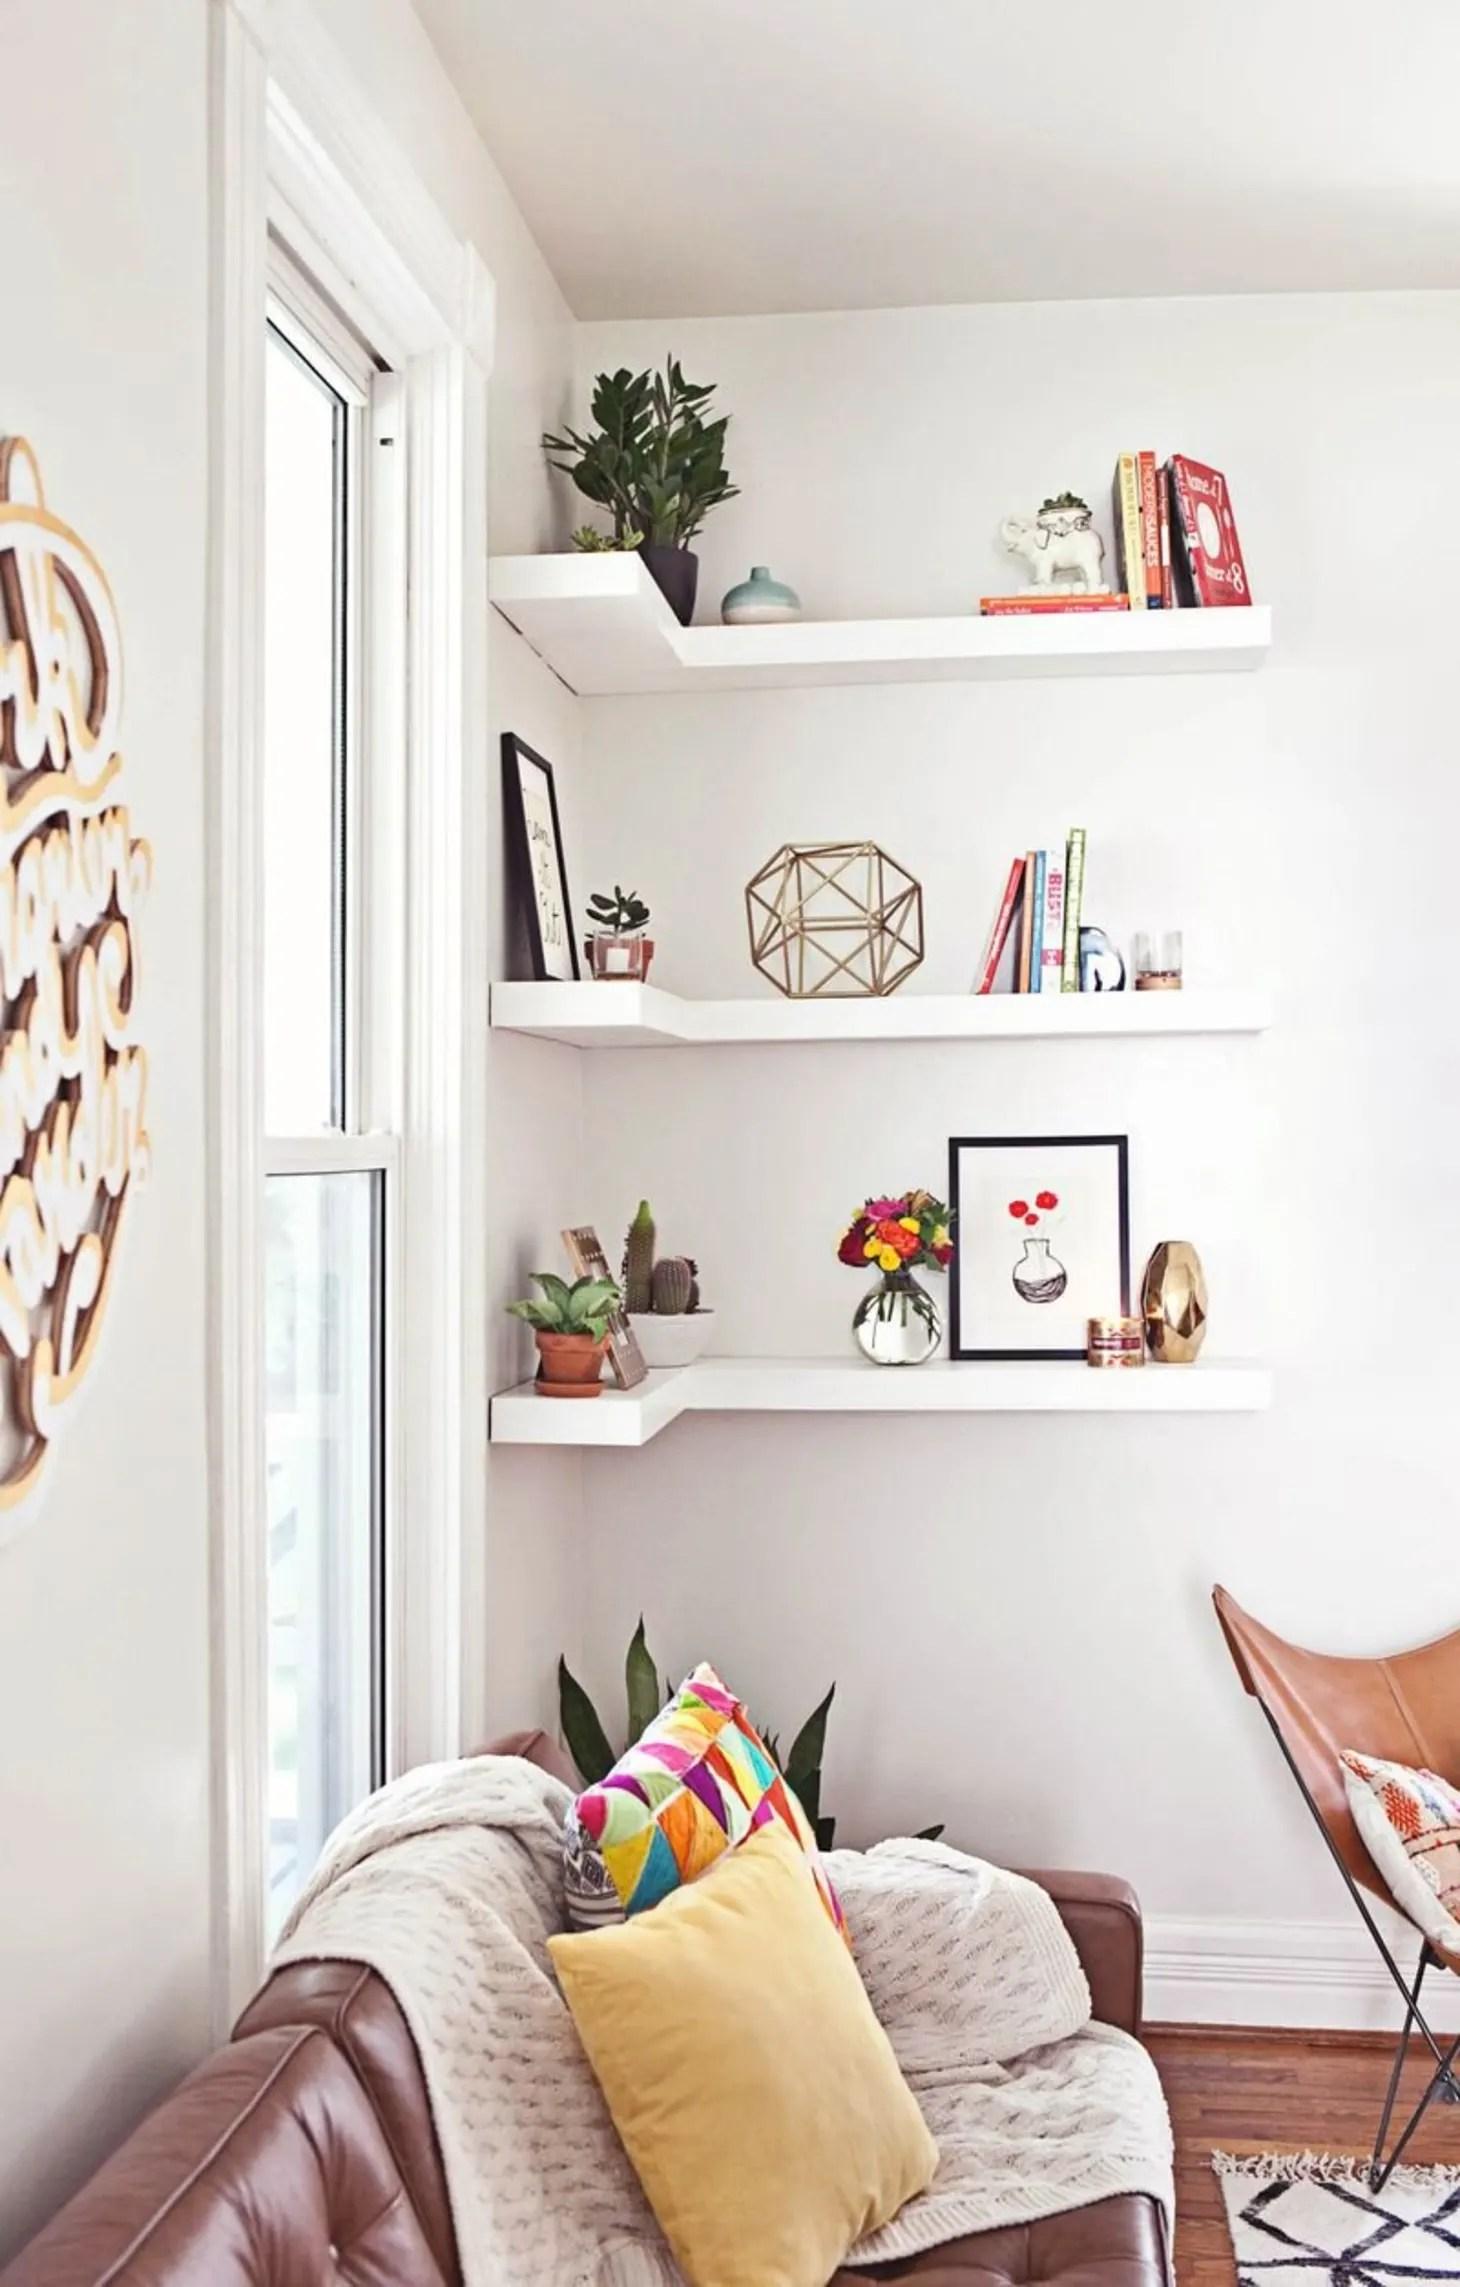 9 Diy Ideas For Empty Room Corners Other Dead Zones